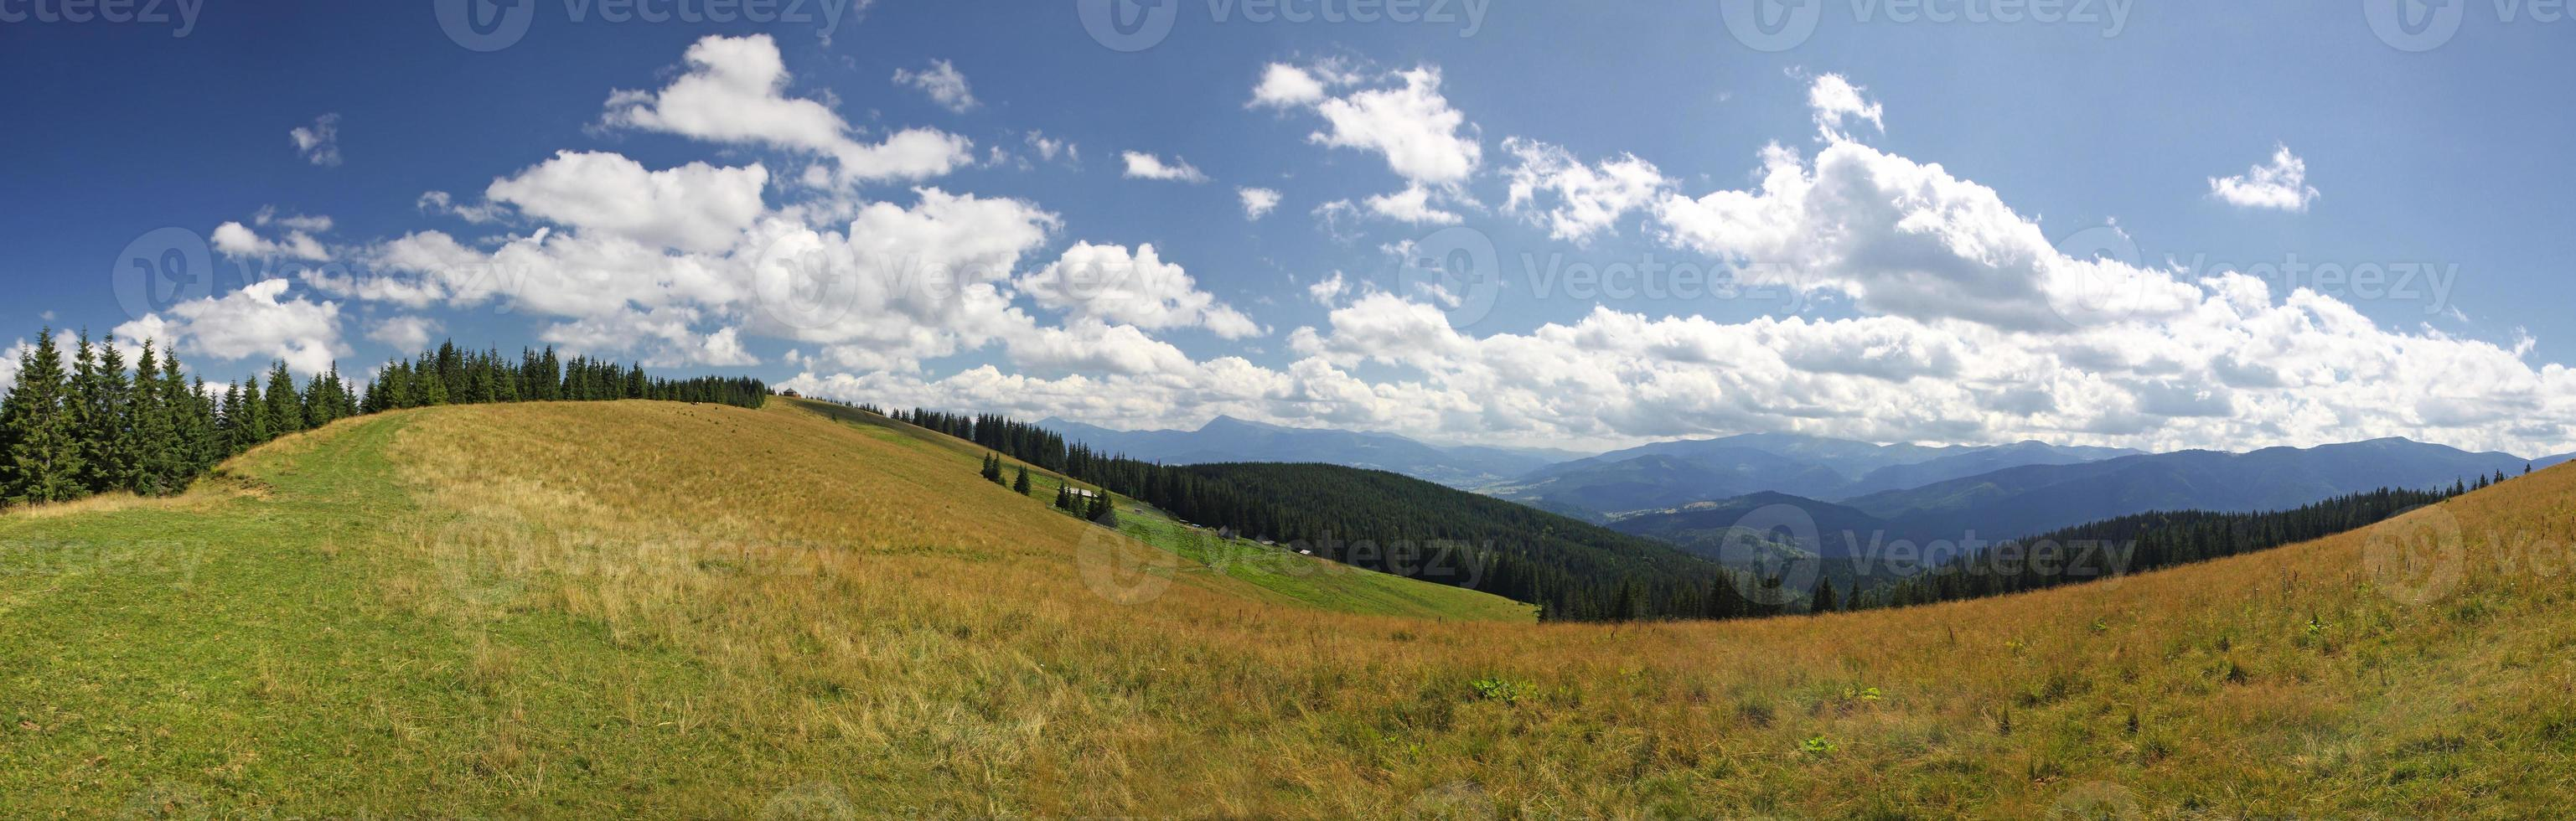 Panoramablick auf Karpaten, Ukraine foto